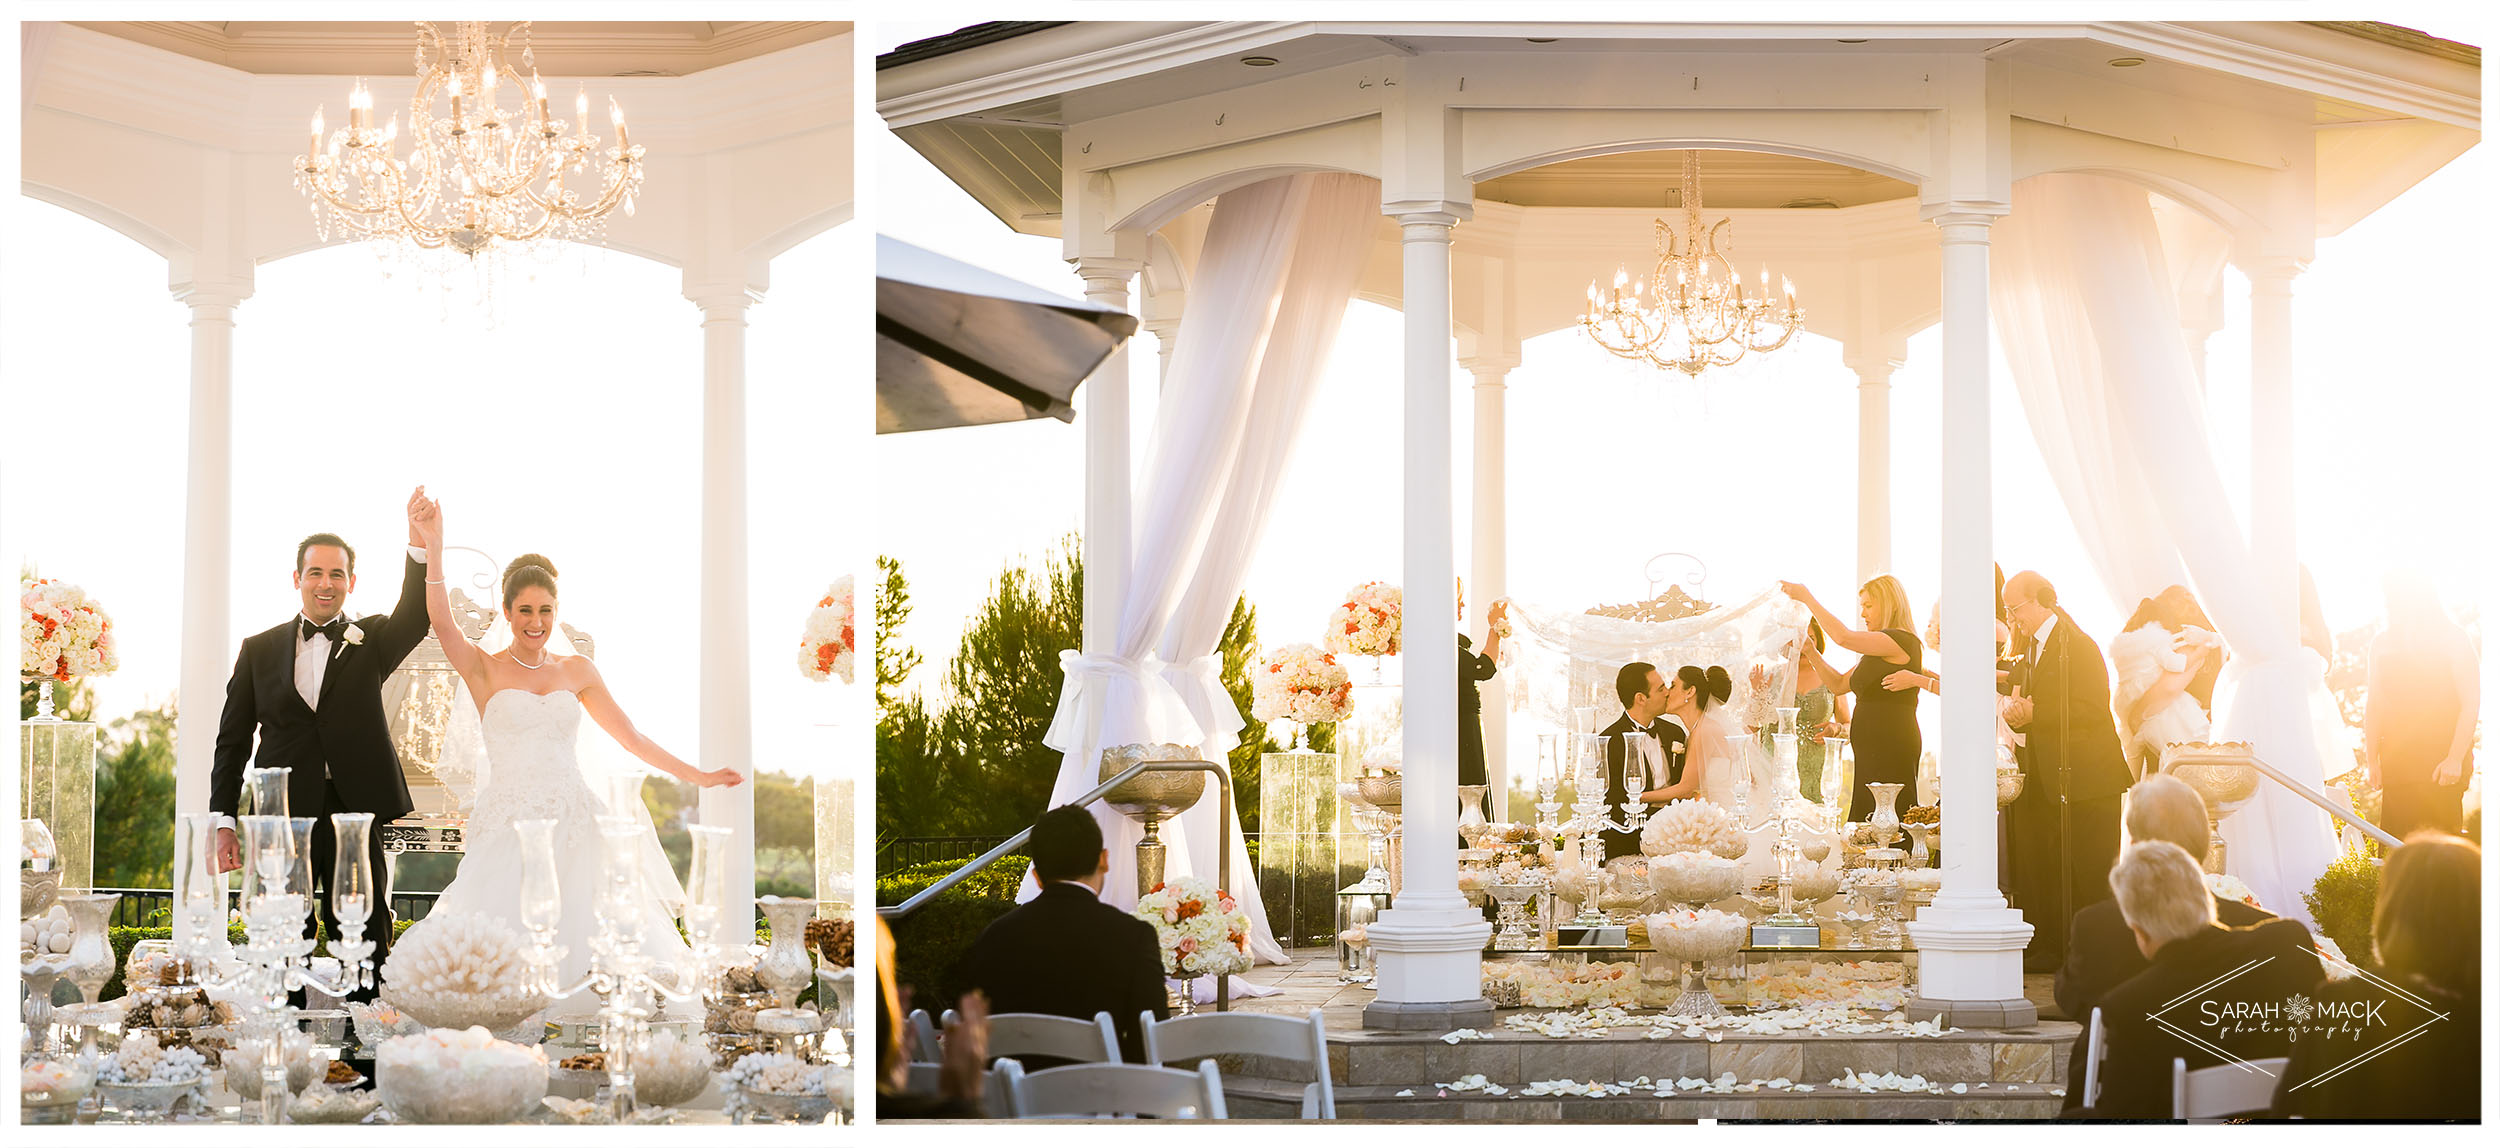 NJ-Newport-Beach-Marriott-Persian-Wedding-31.jpg